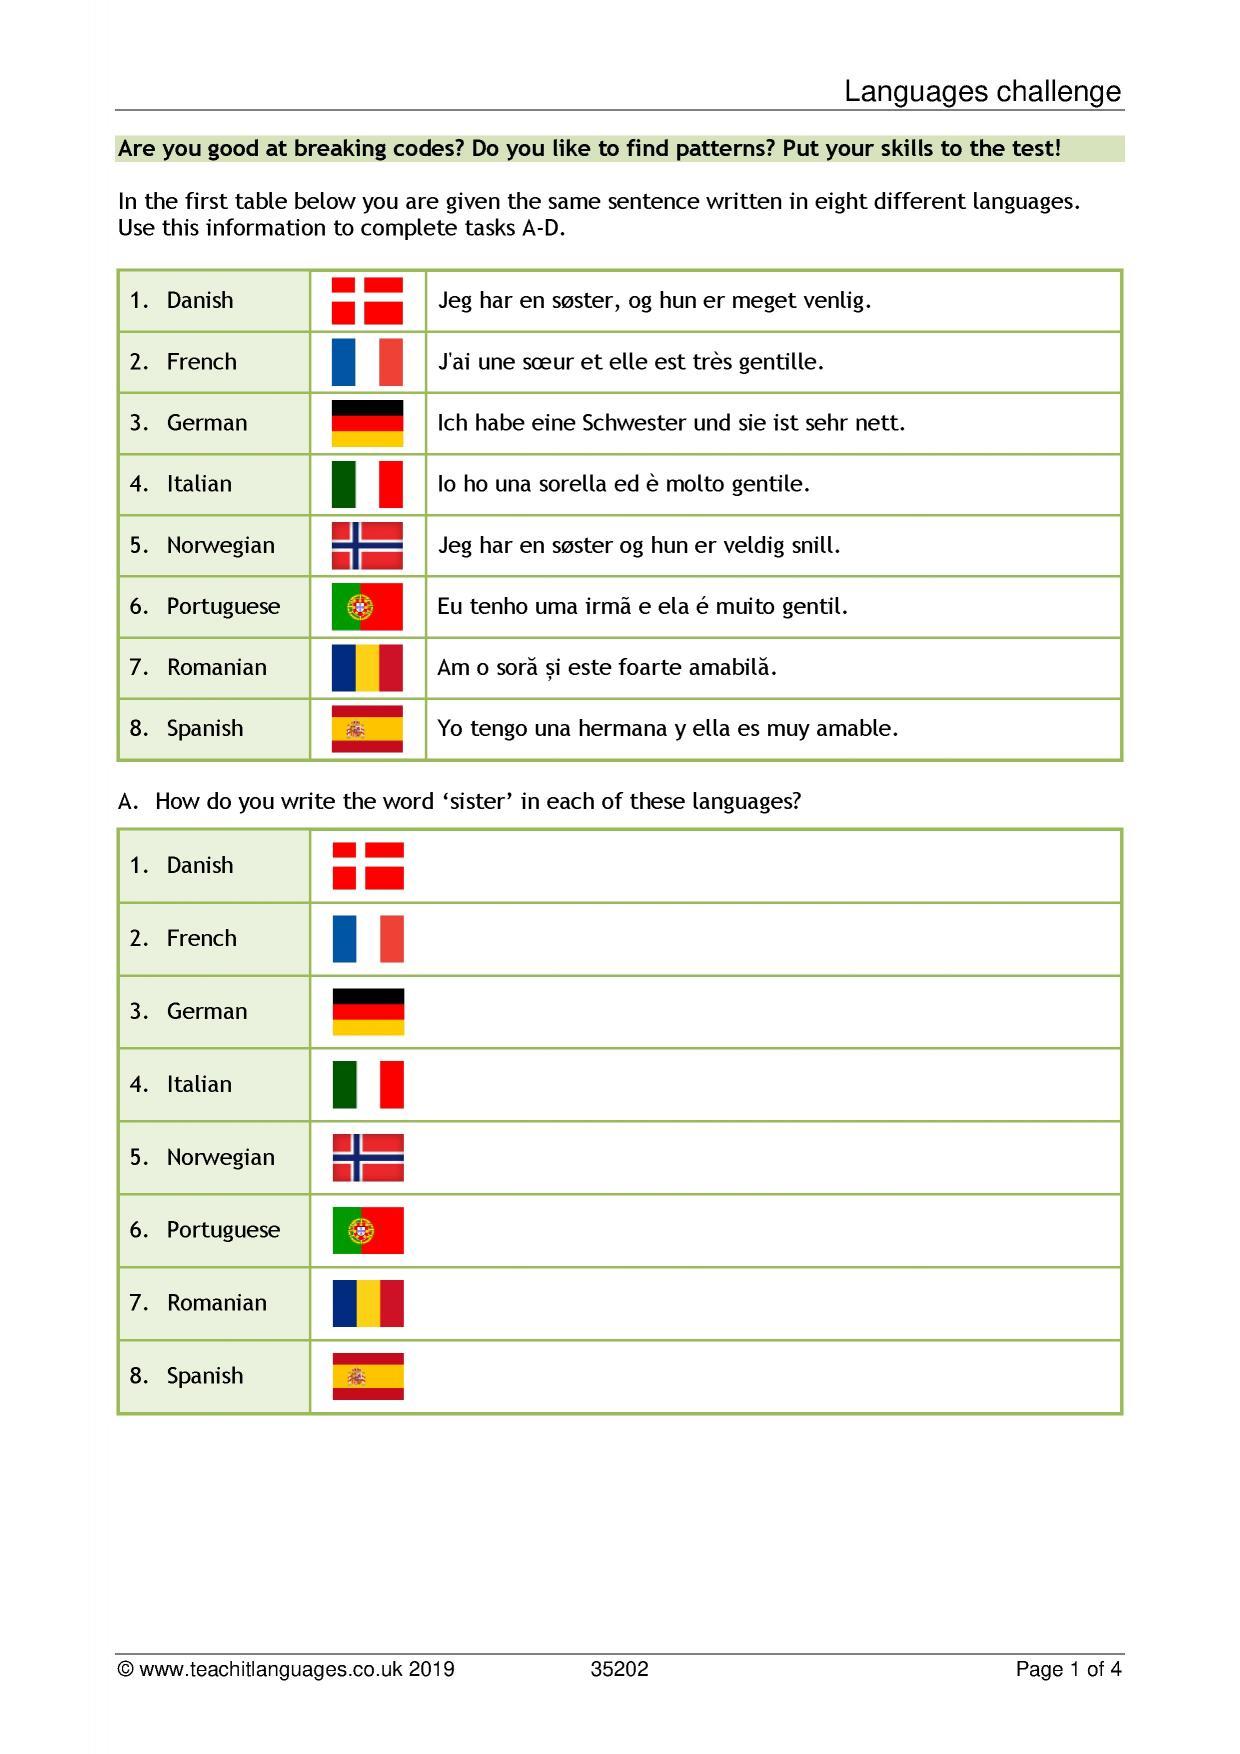 French language teaching resources | TeachIt Languages - Teachit Languages